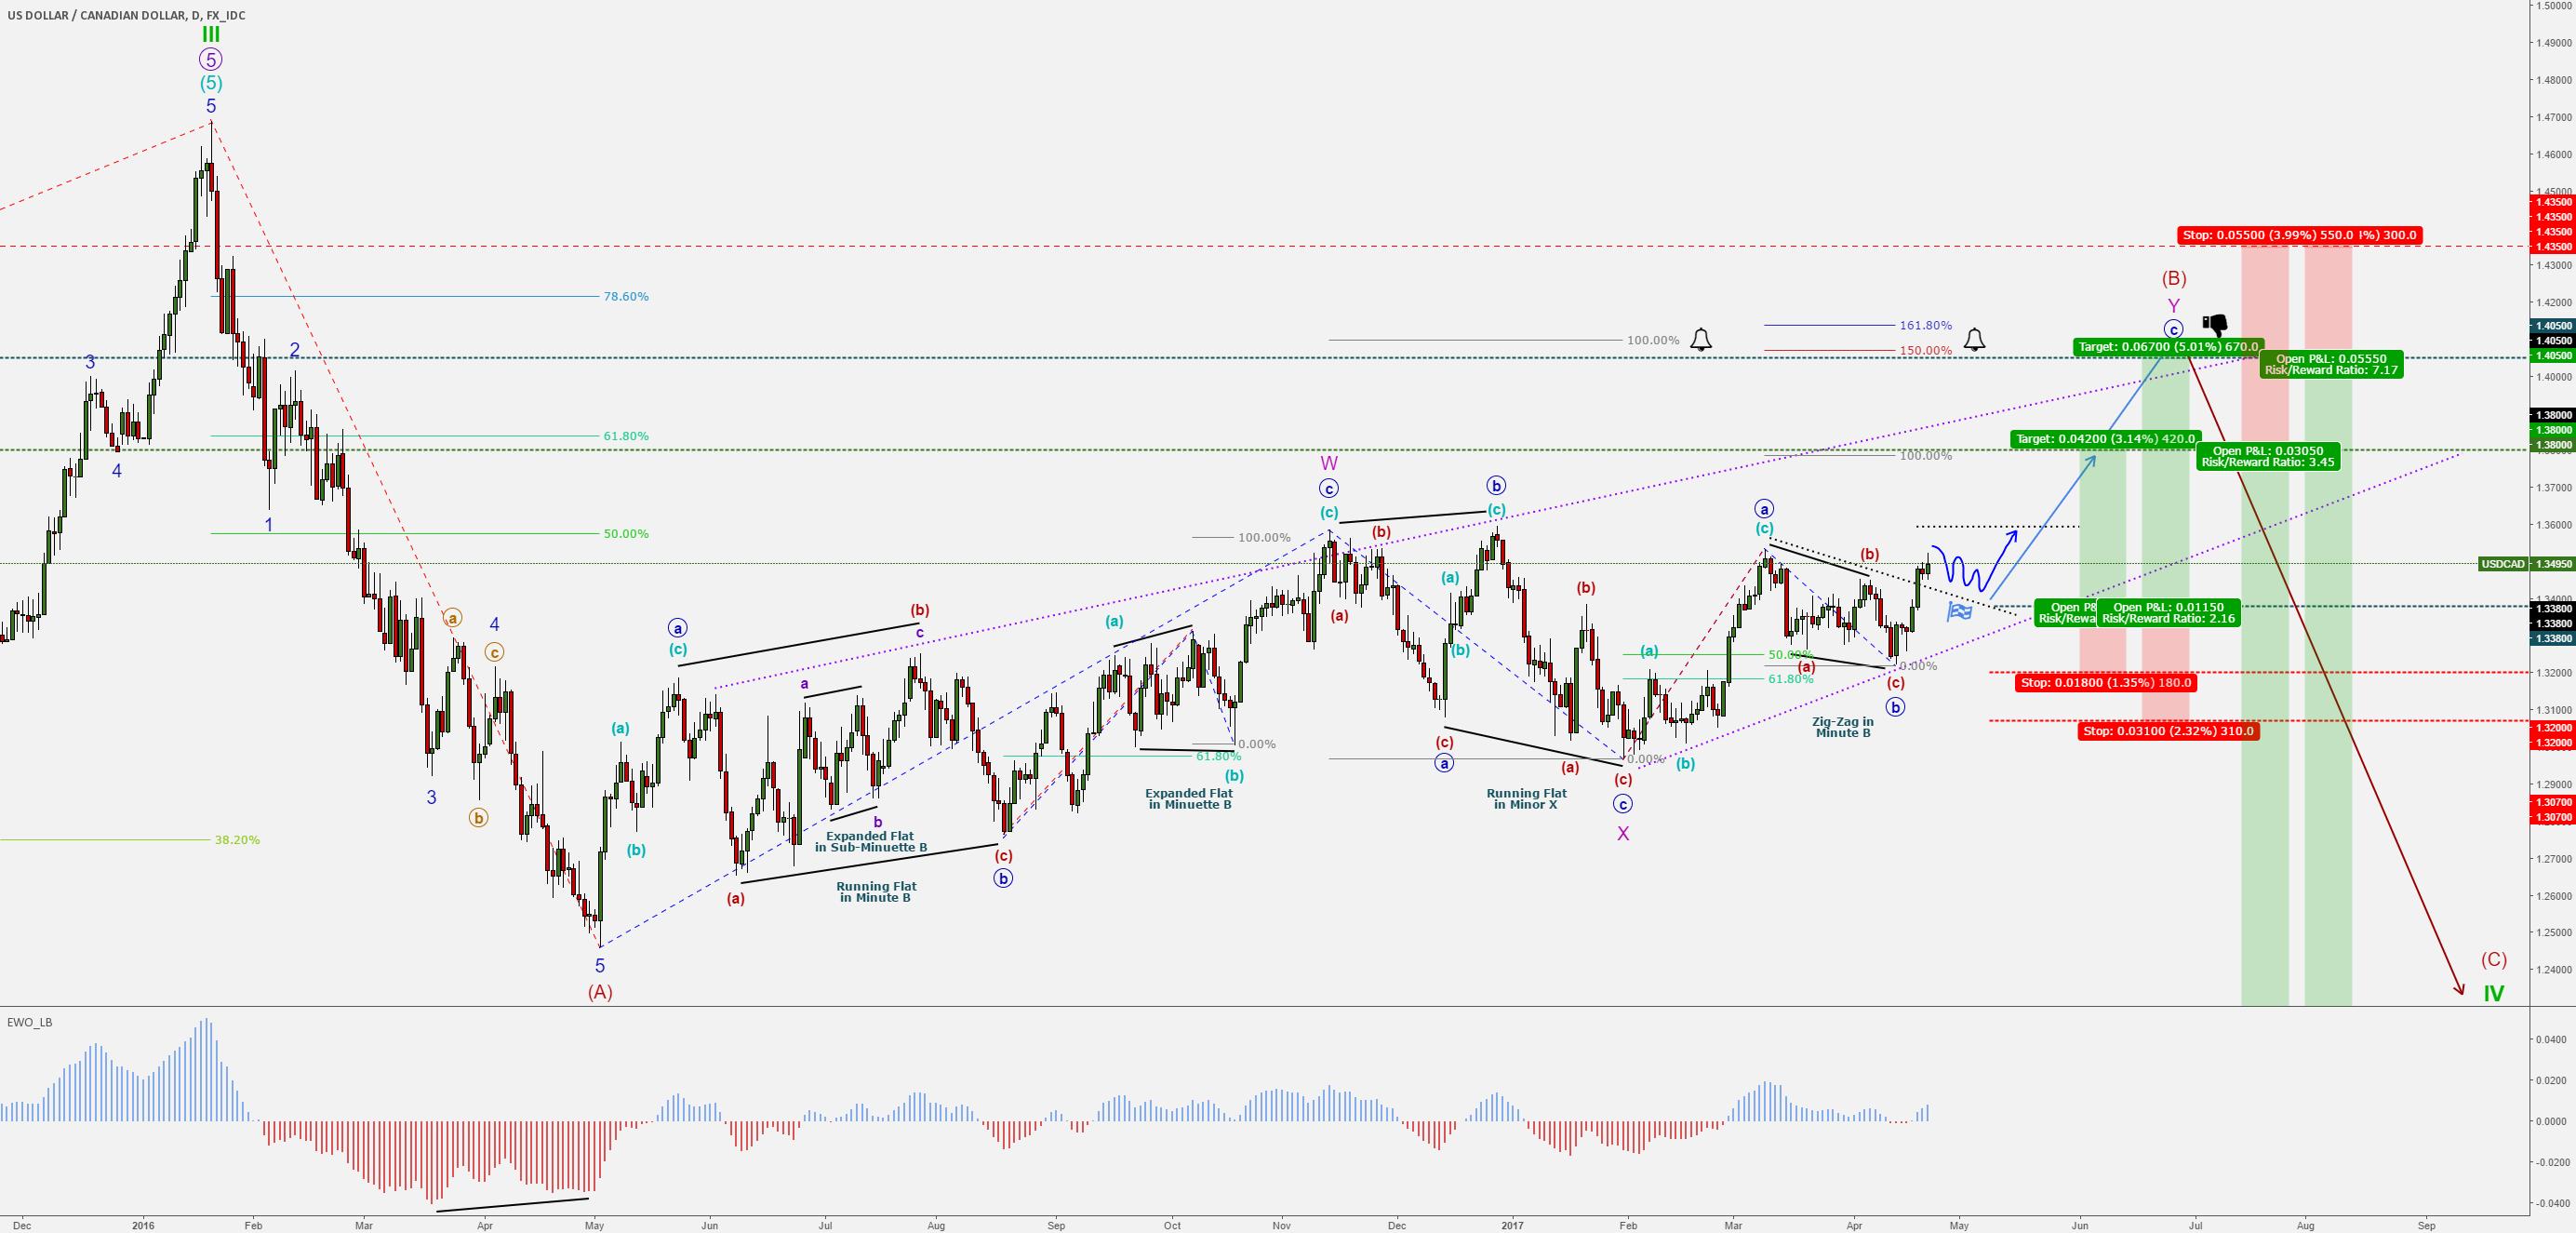 USD/CAD (dollar/loonie) - EW - Long Term Forecast - BUY & SELL